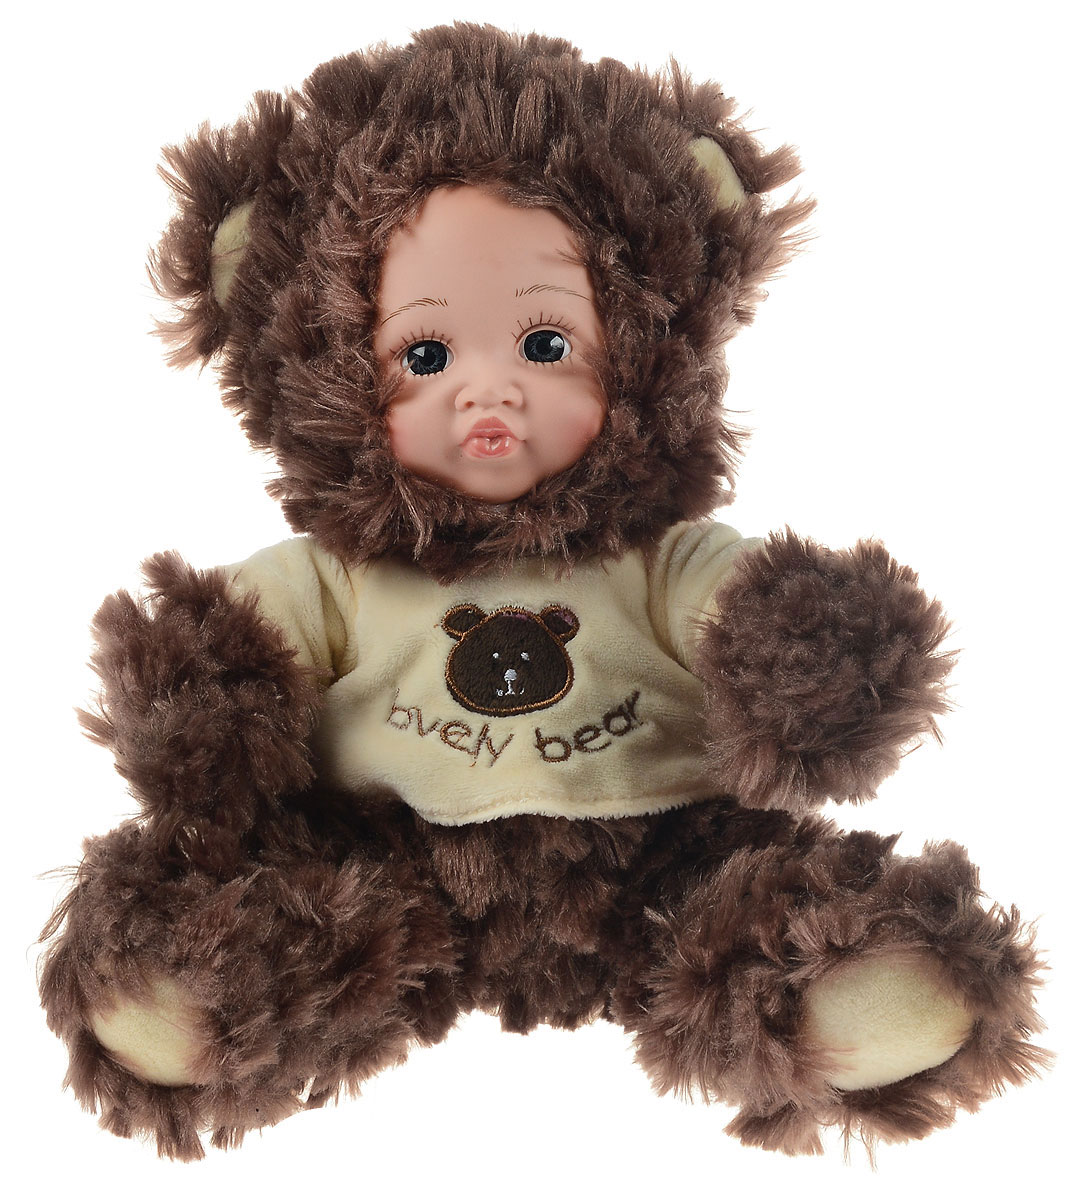 Fluffy Family Кукла Мой мишка fluffy family мишка тоша 70 см